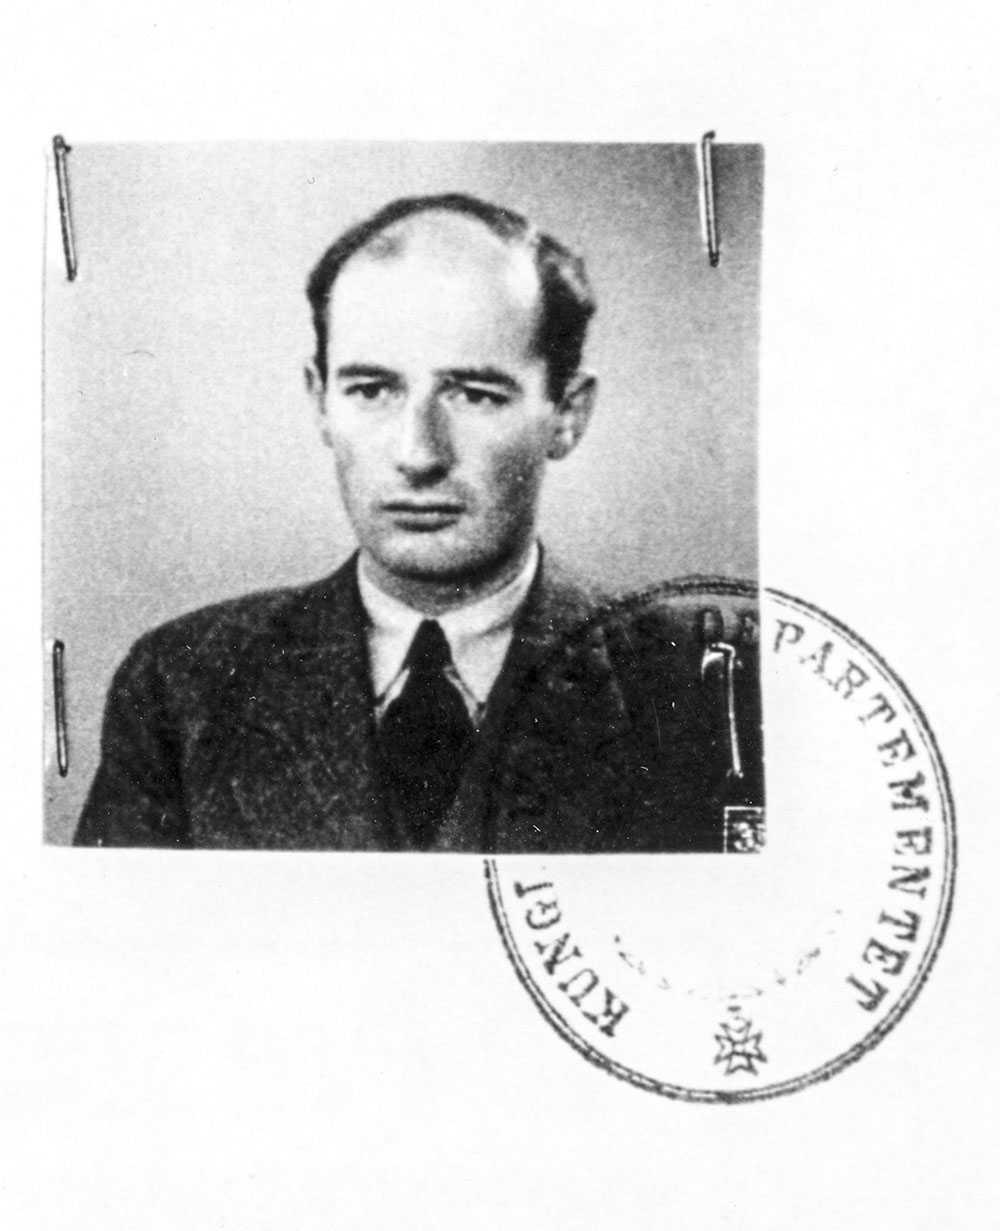 Passbild på Raoul Wallenberg.